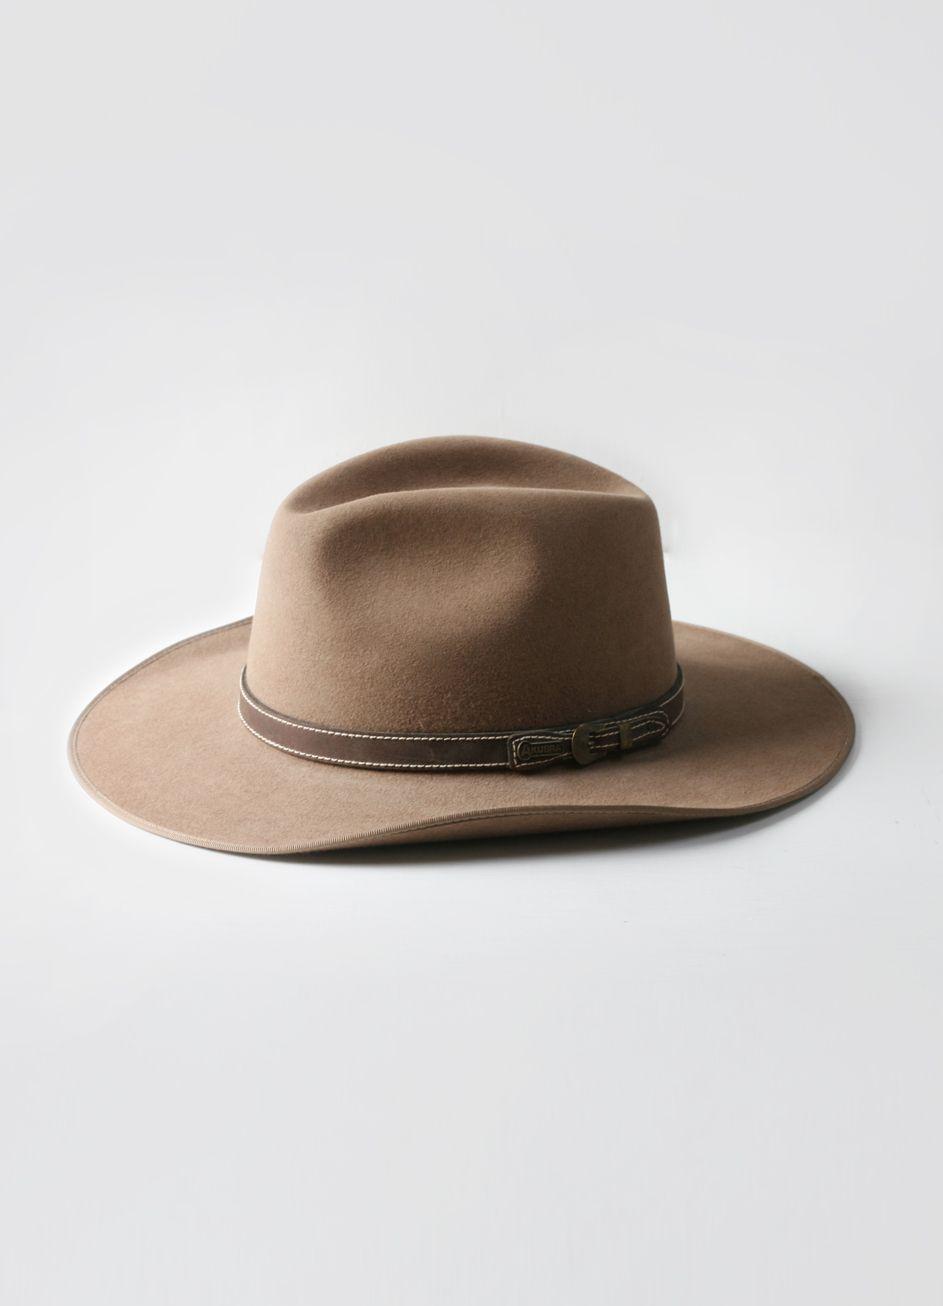 56d8aafd1621c Vintage Akubra Felt Hat — Everything Golden